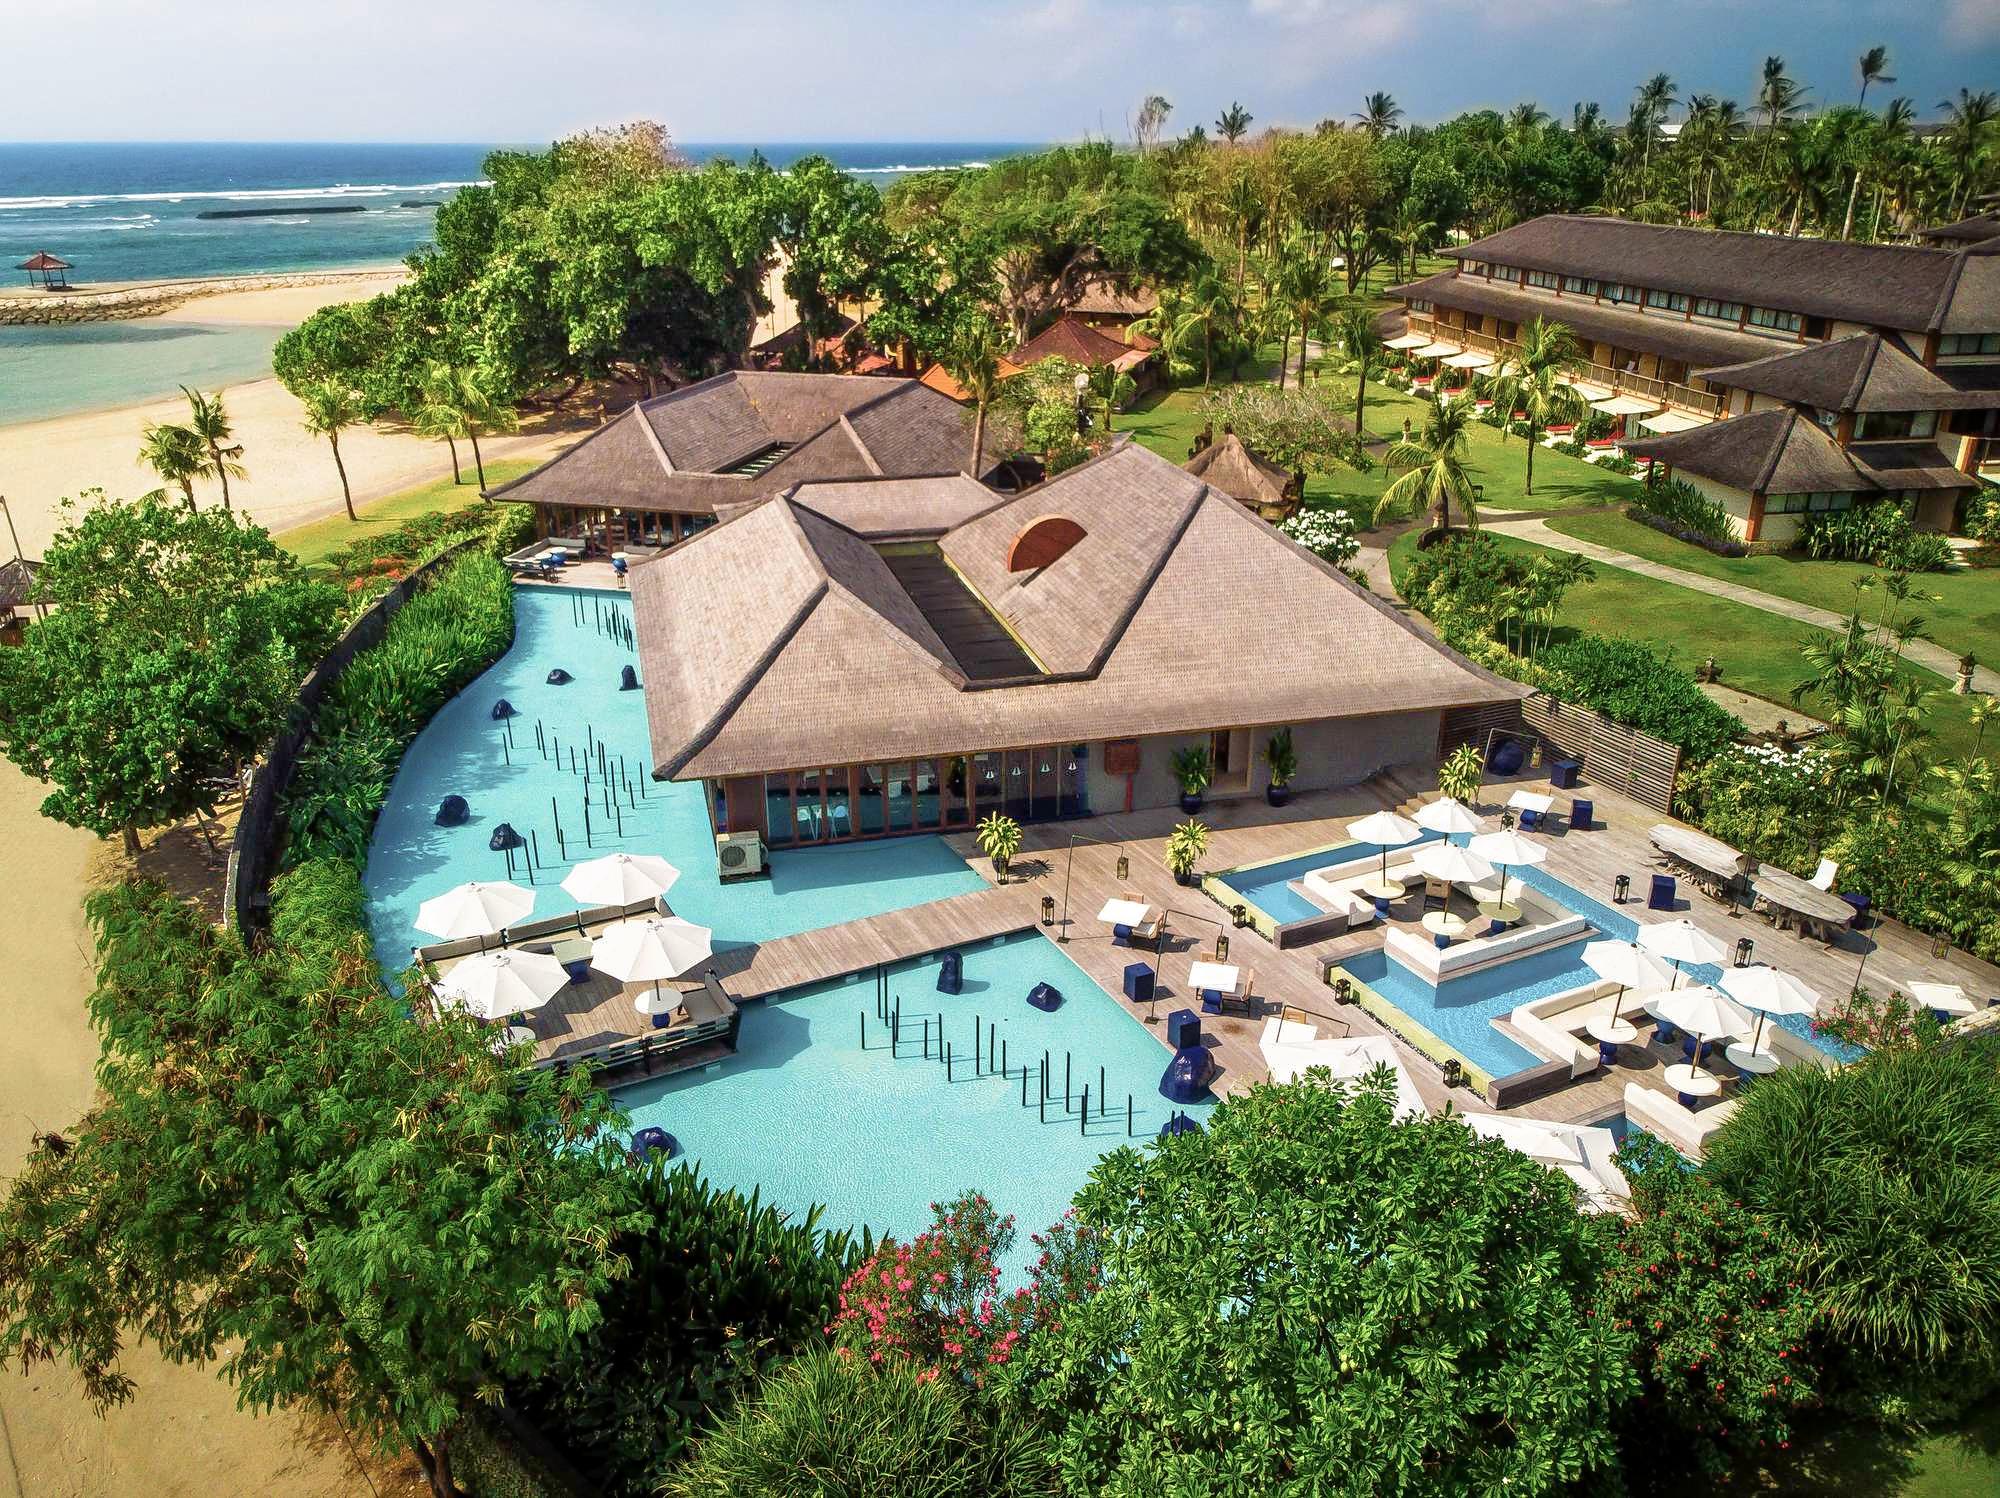 1557751028_https___ns.clubmed.com_dream_resorts_3t___4t_asie_et_ocean_indien_bali_169573-1lng9n8nnf-swhr.jpg